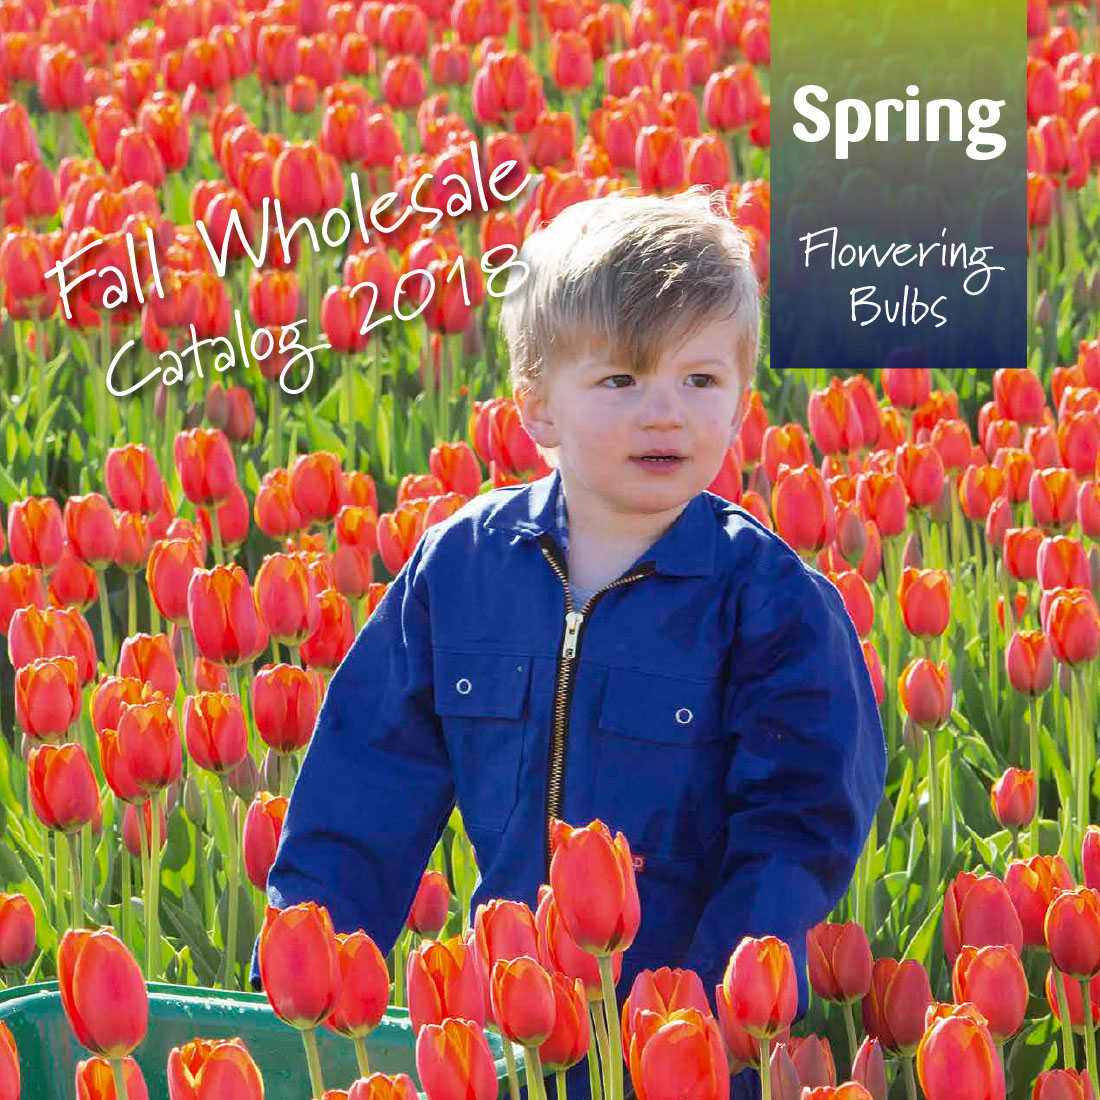 Fall Wholesale 2018 Ruigrok Flowerbulbs